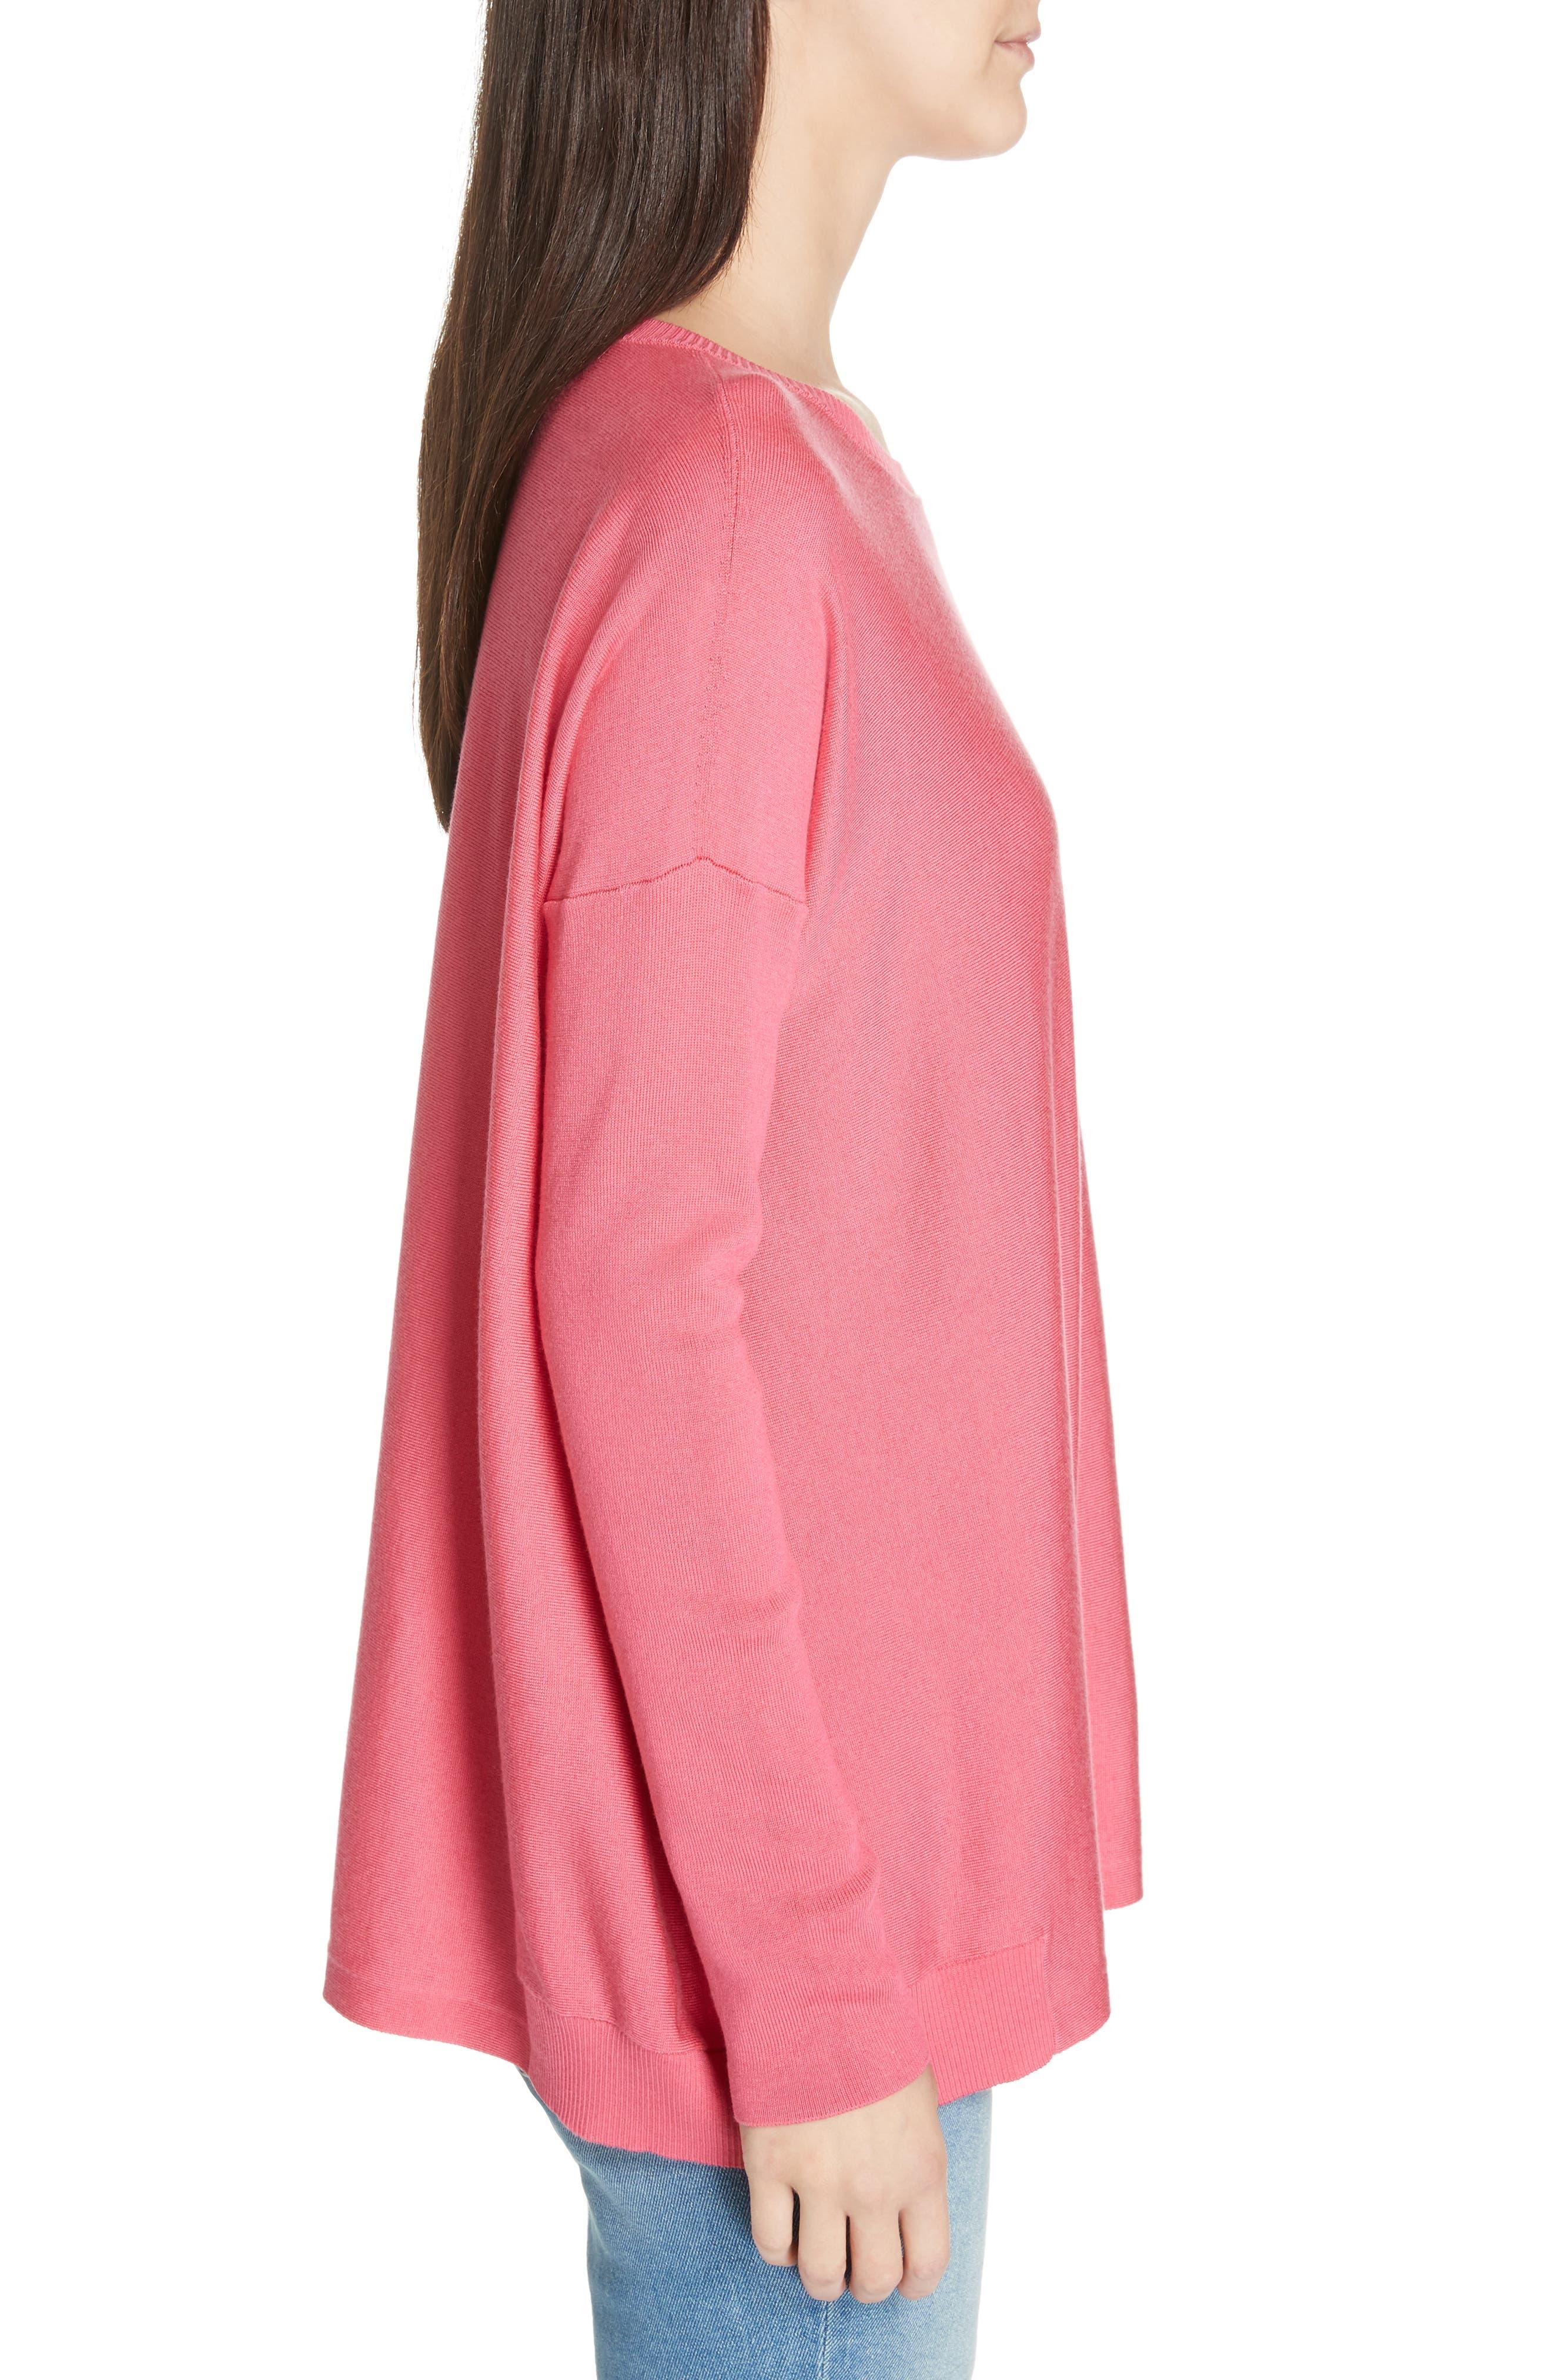 Tencel<sup>®</sup> Lyocell Blend Sweater,                             Alternate thumbnail 3, color,                             CHERRY LANE